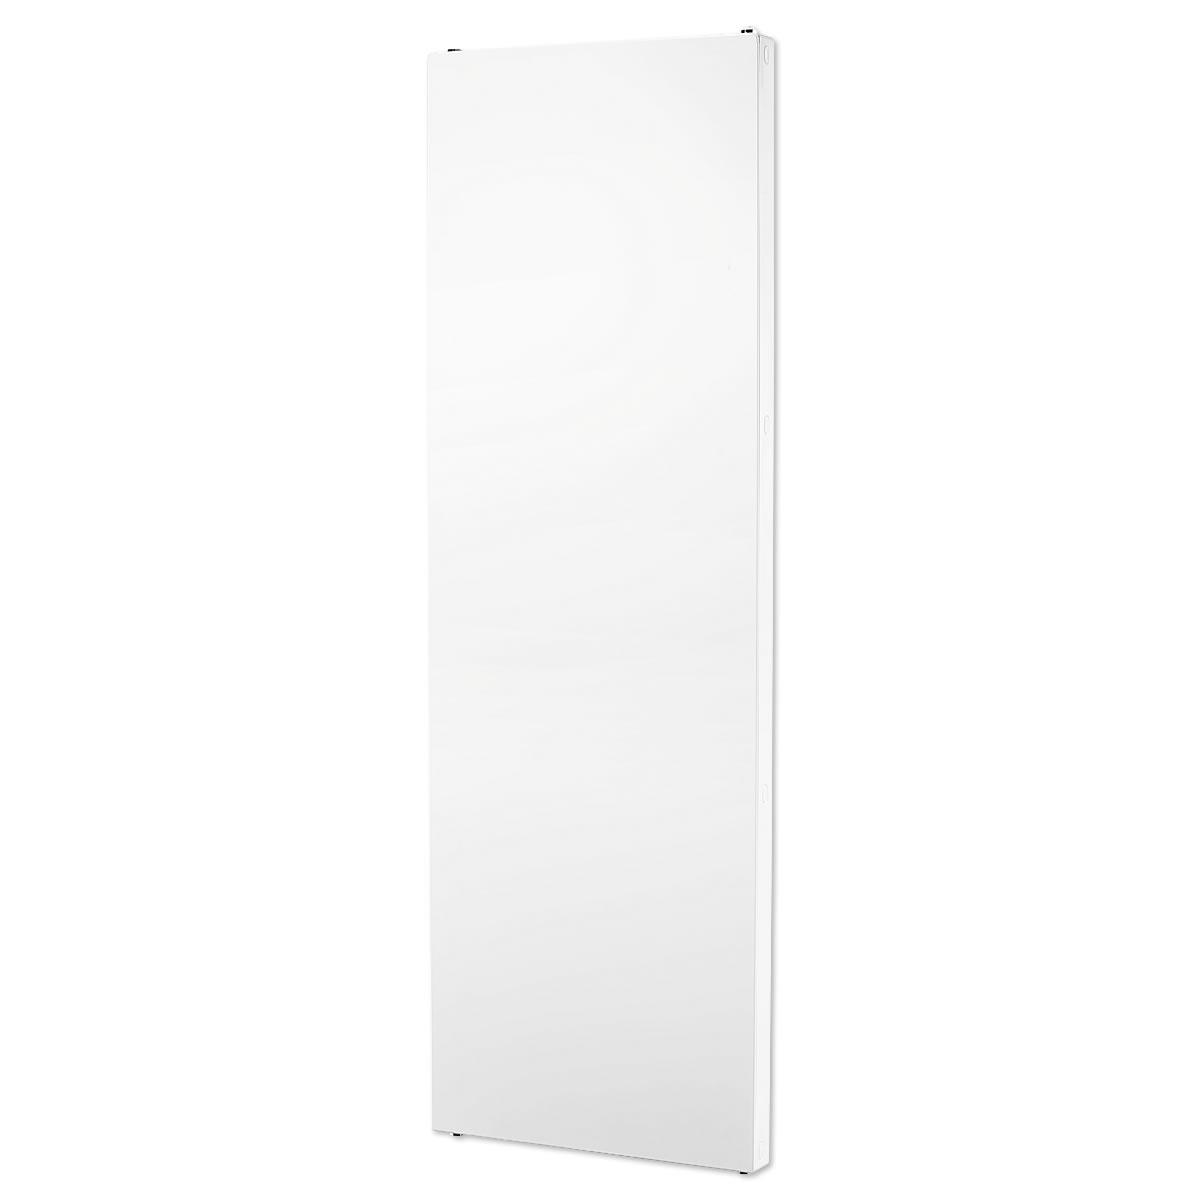 buderus logatrend cv plan vertikal heizk rper h mm l 600 mm typ 20 1301 833 watt. Black Bedroom Furniture Sets. Home Design Ideas